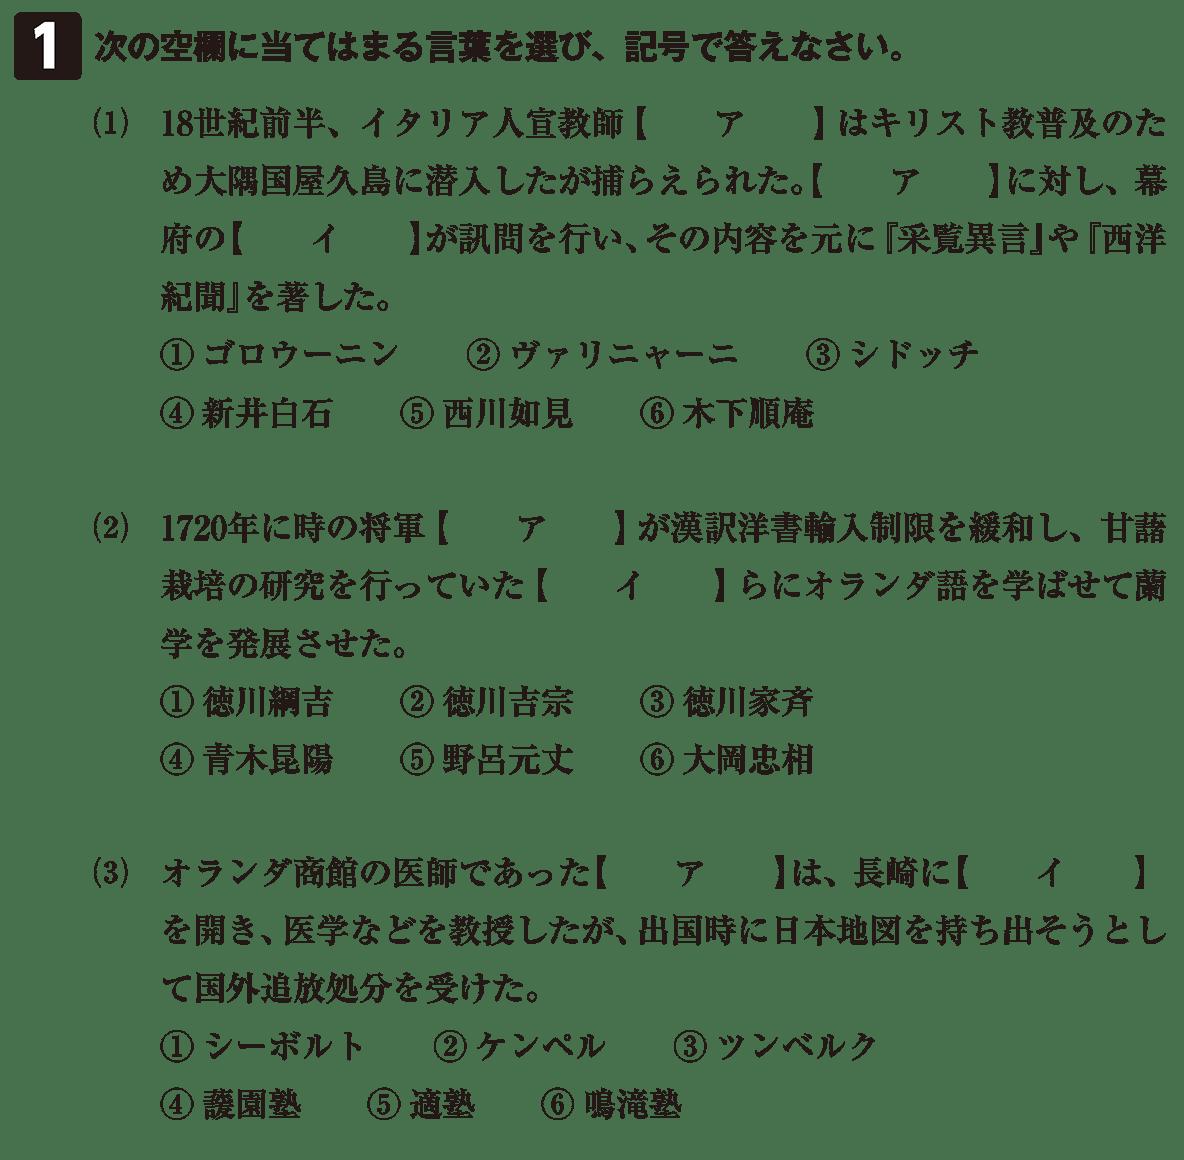 近世の文化33 問題1 問題